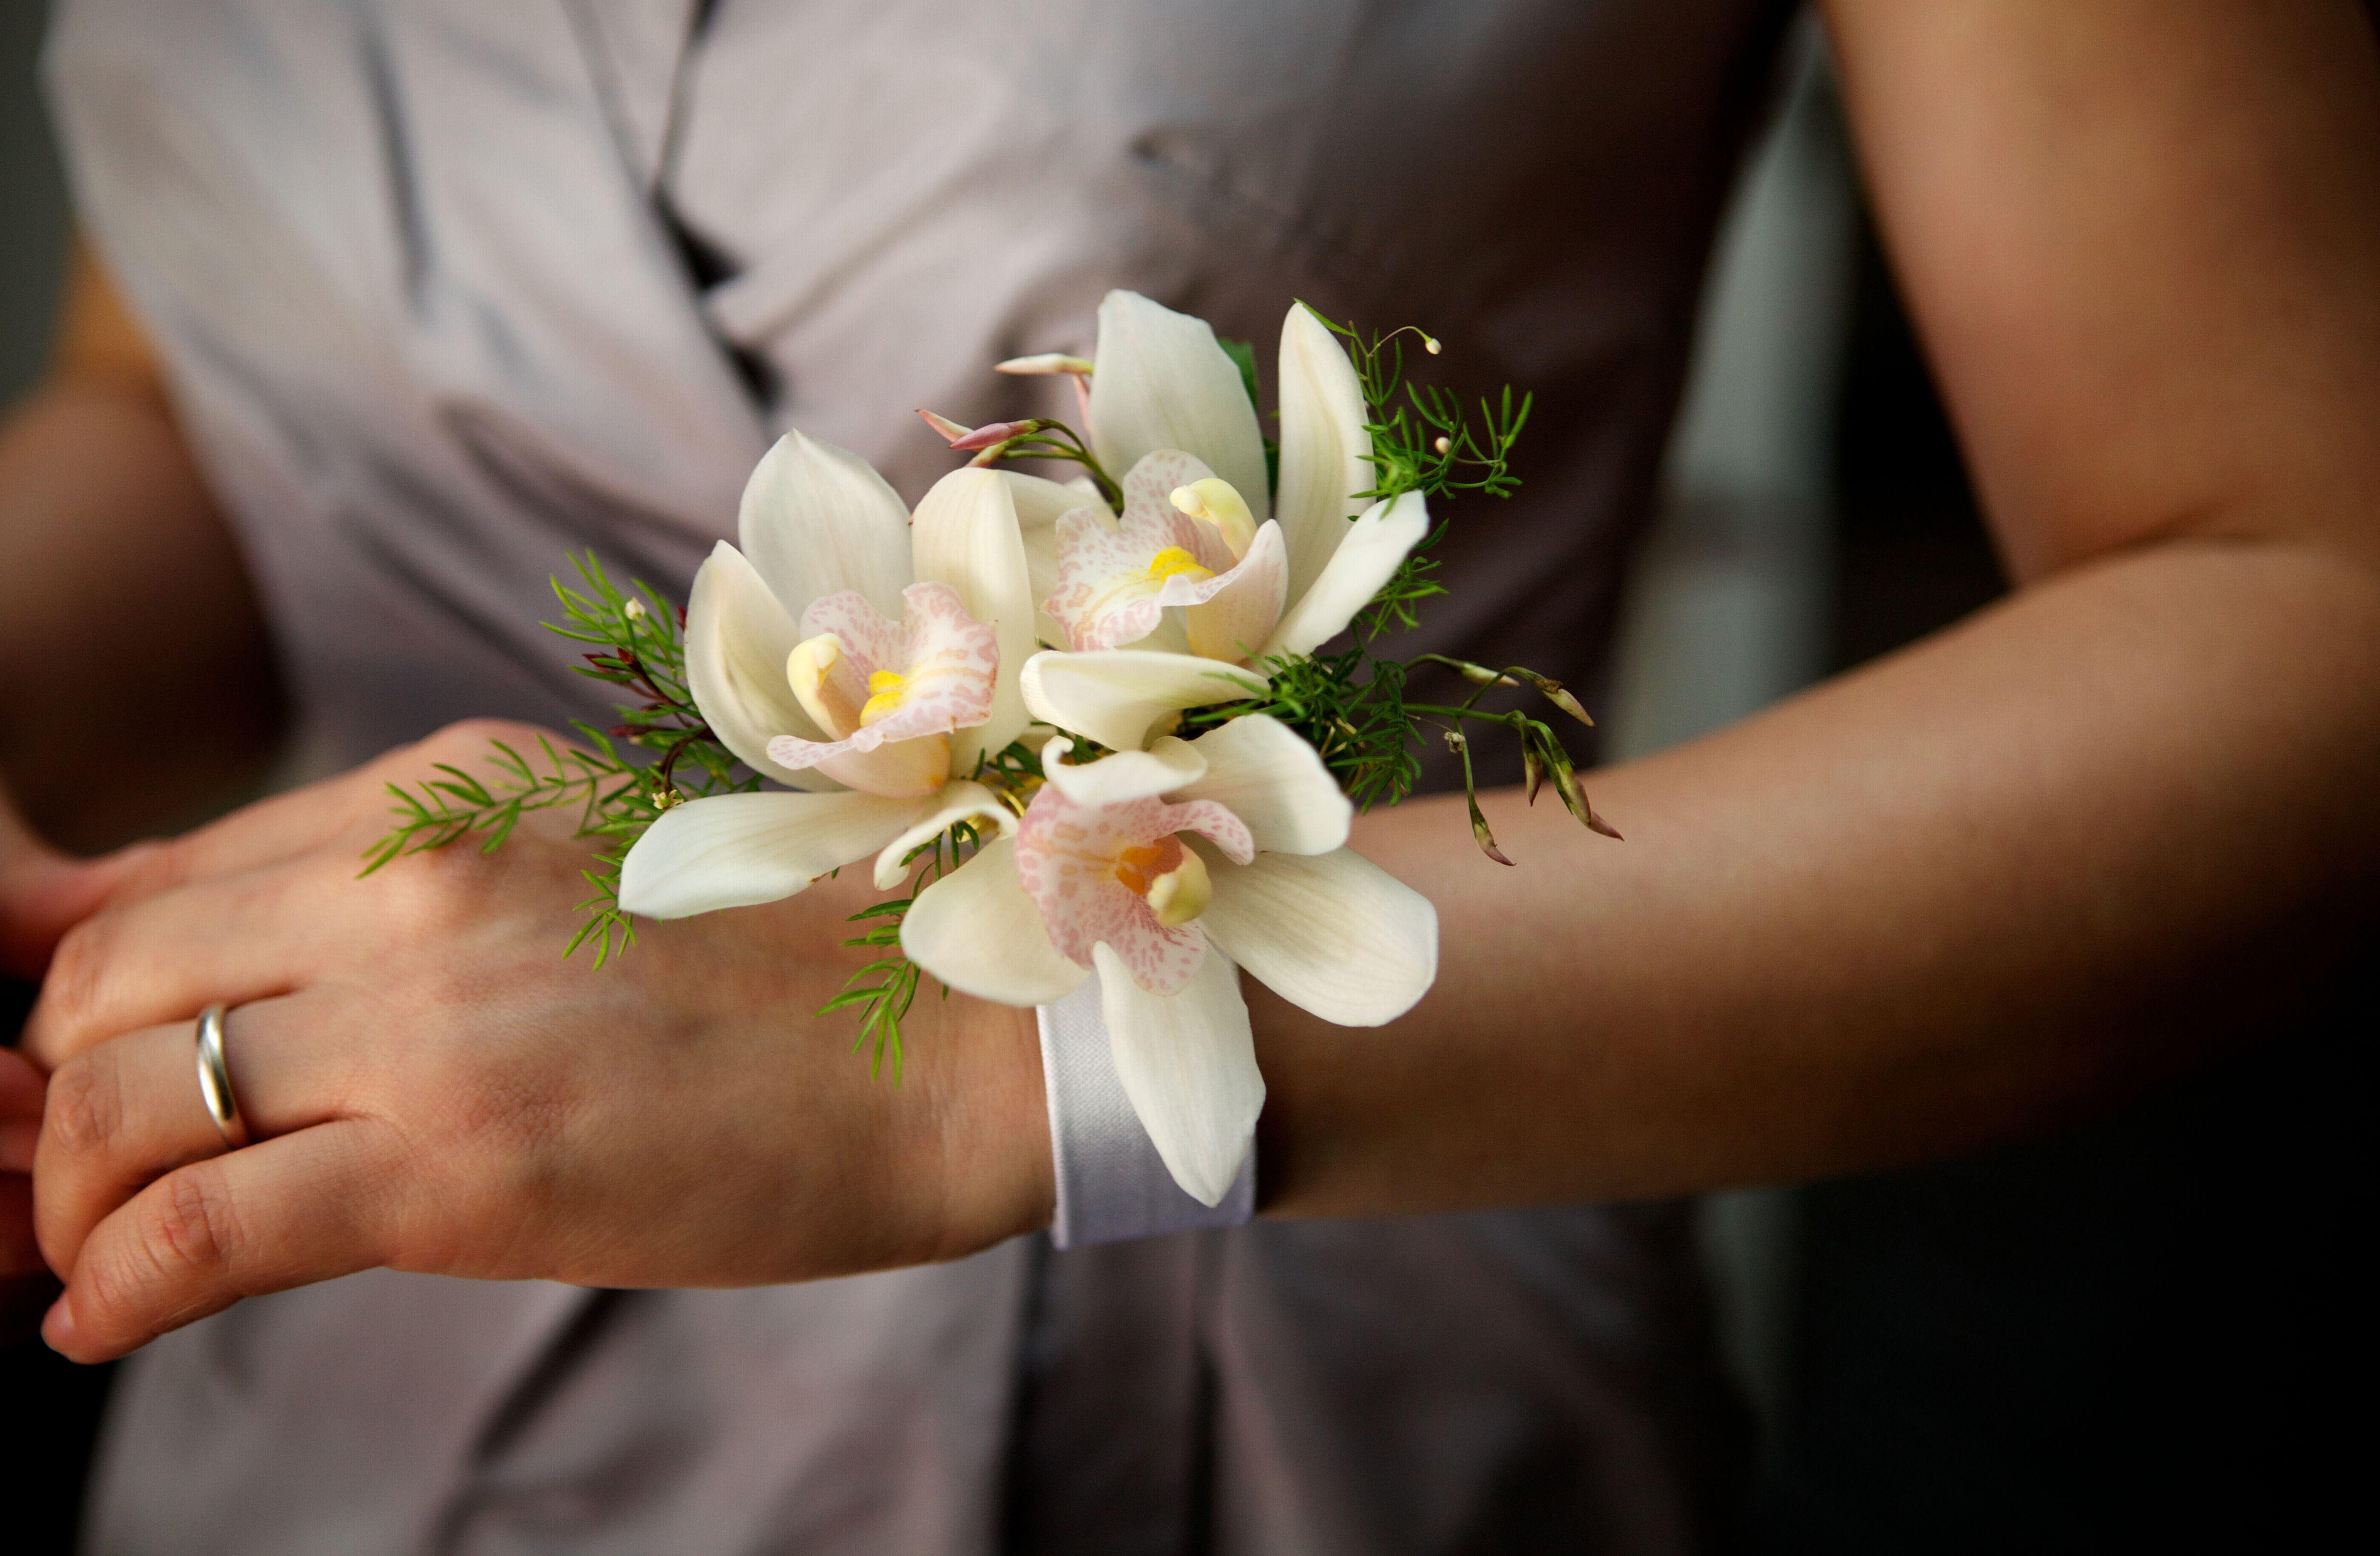 Cymbidium Orchid Wrist Corsages: Tianyi-thor-Cymbidium-Orchid